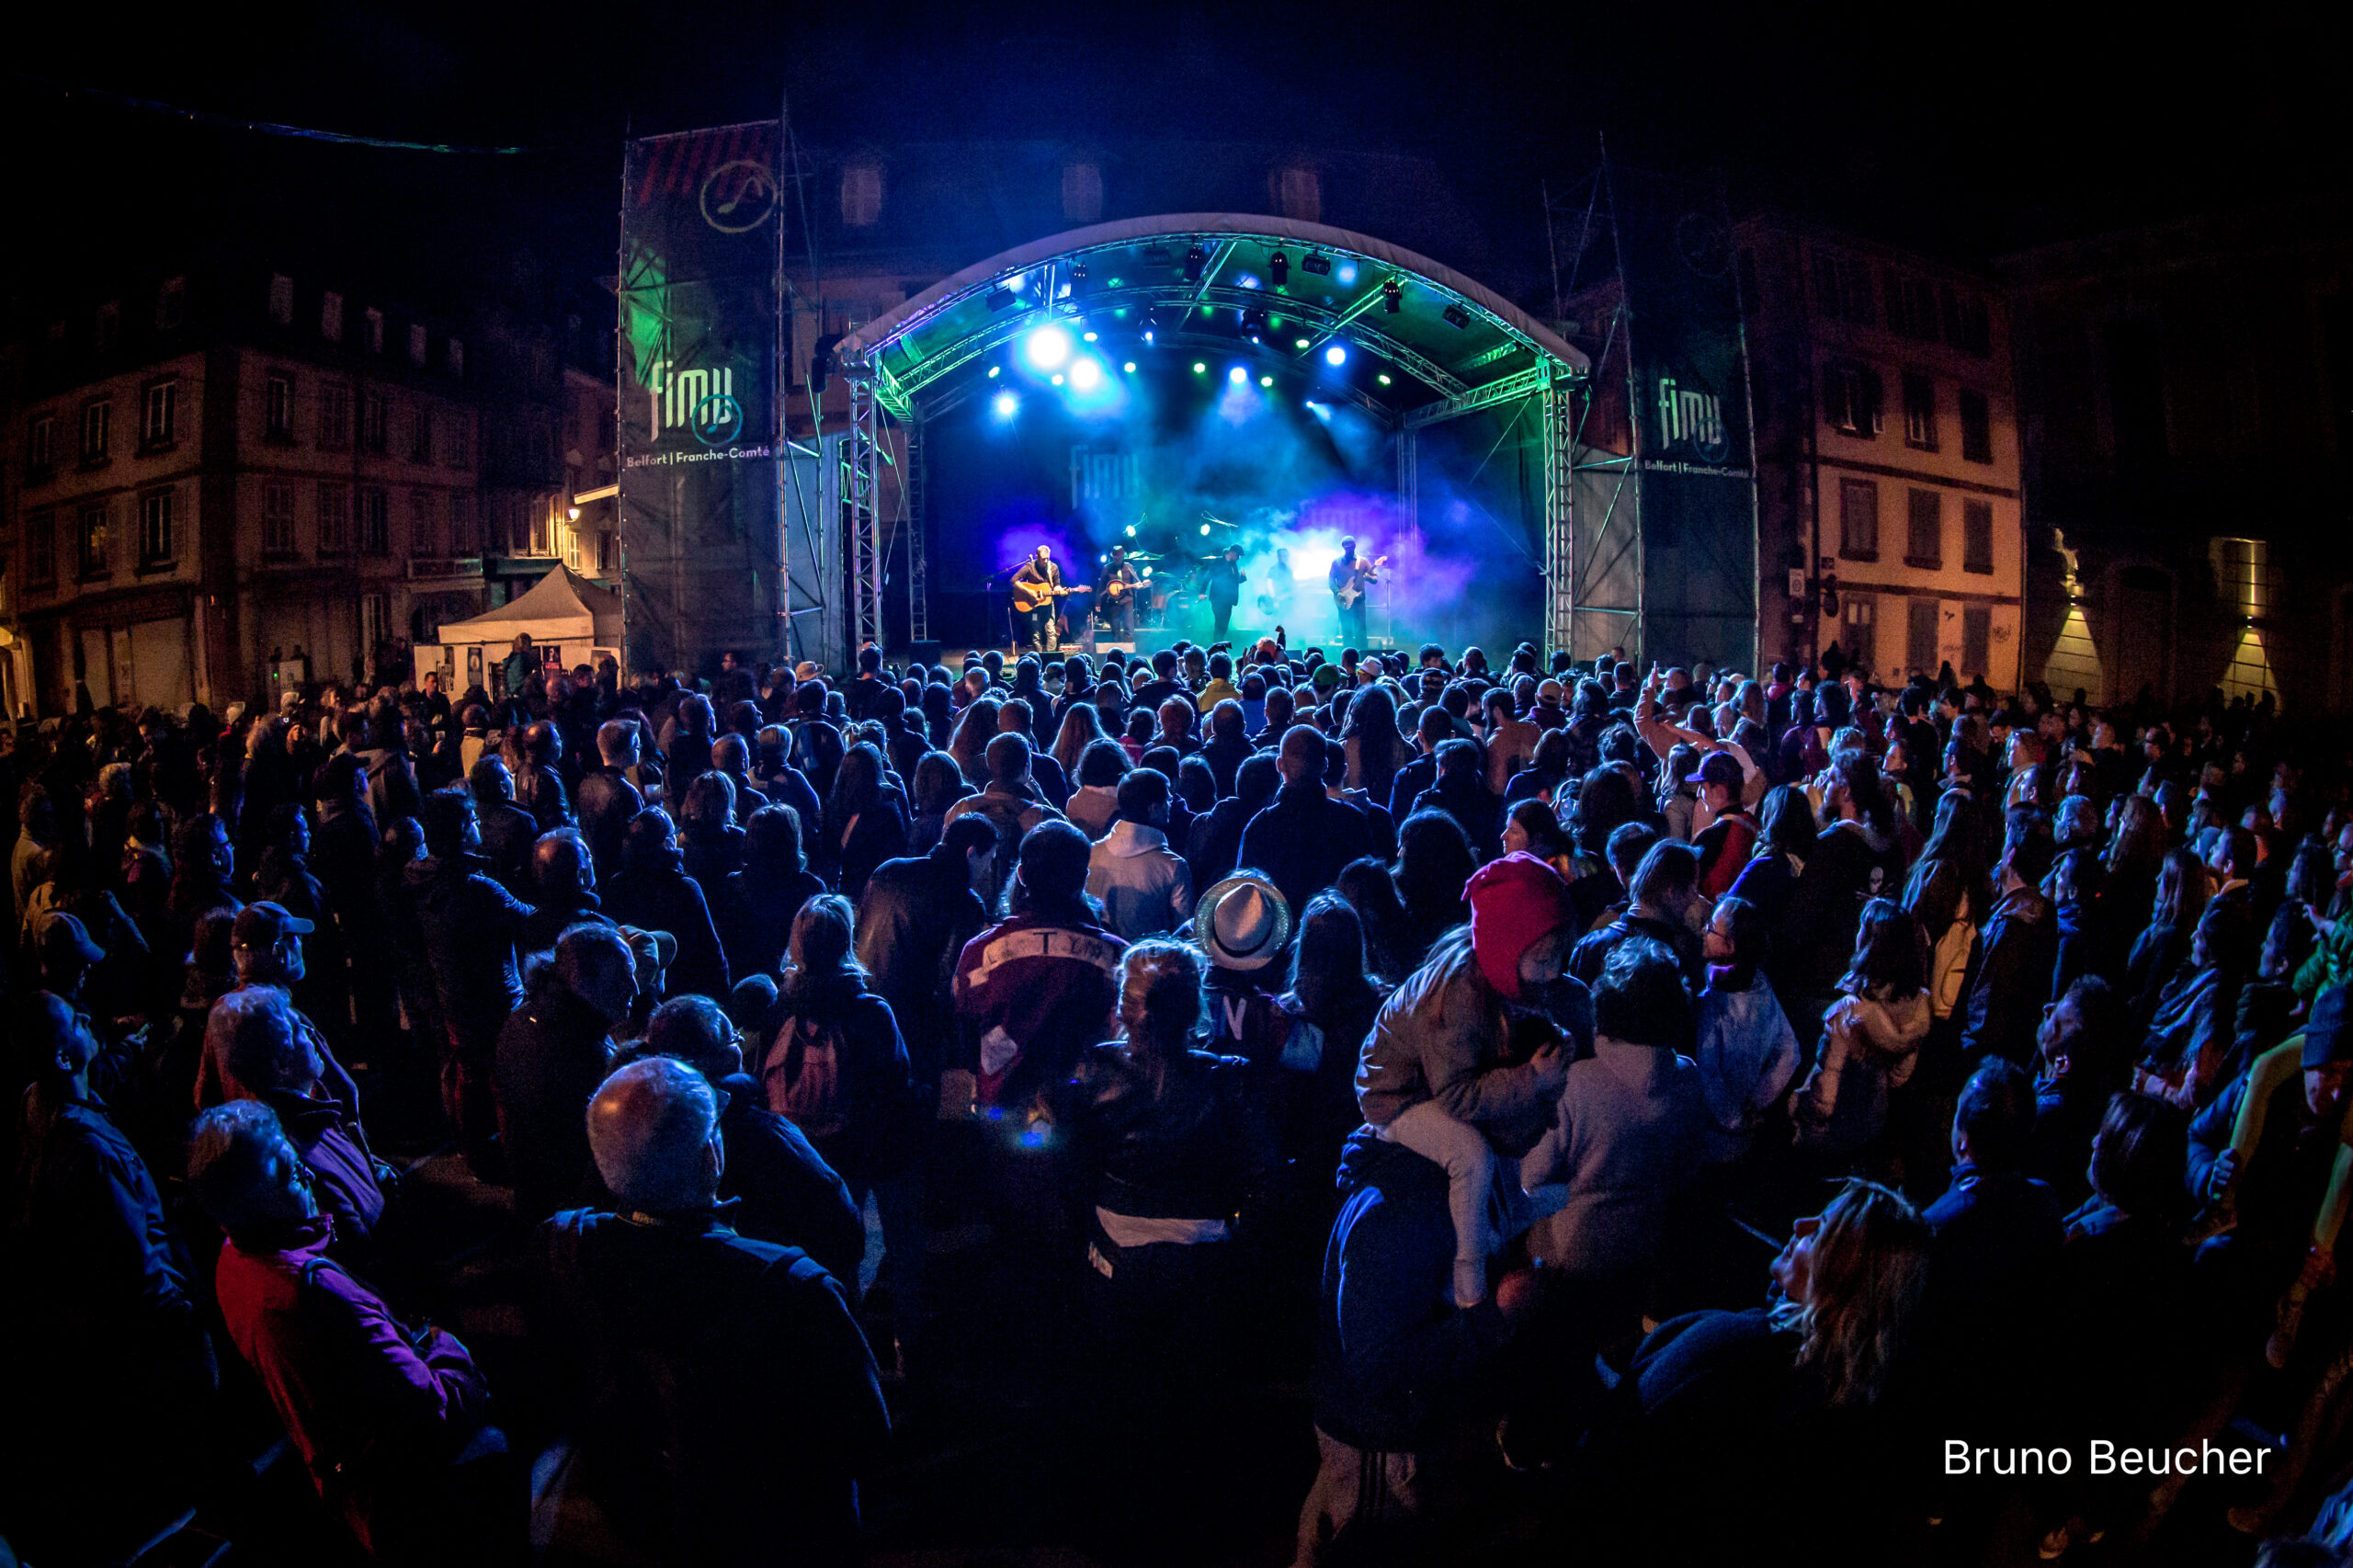 Belfort, Territoire de Belfort (90), mai 2016 : la foule devant The Crook and the Dylan's au FIMU